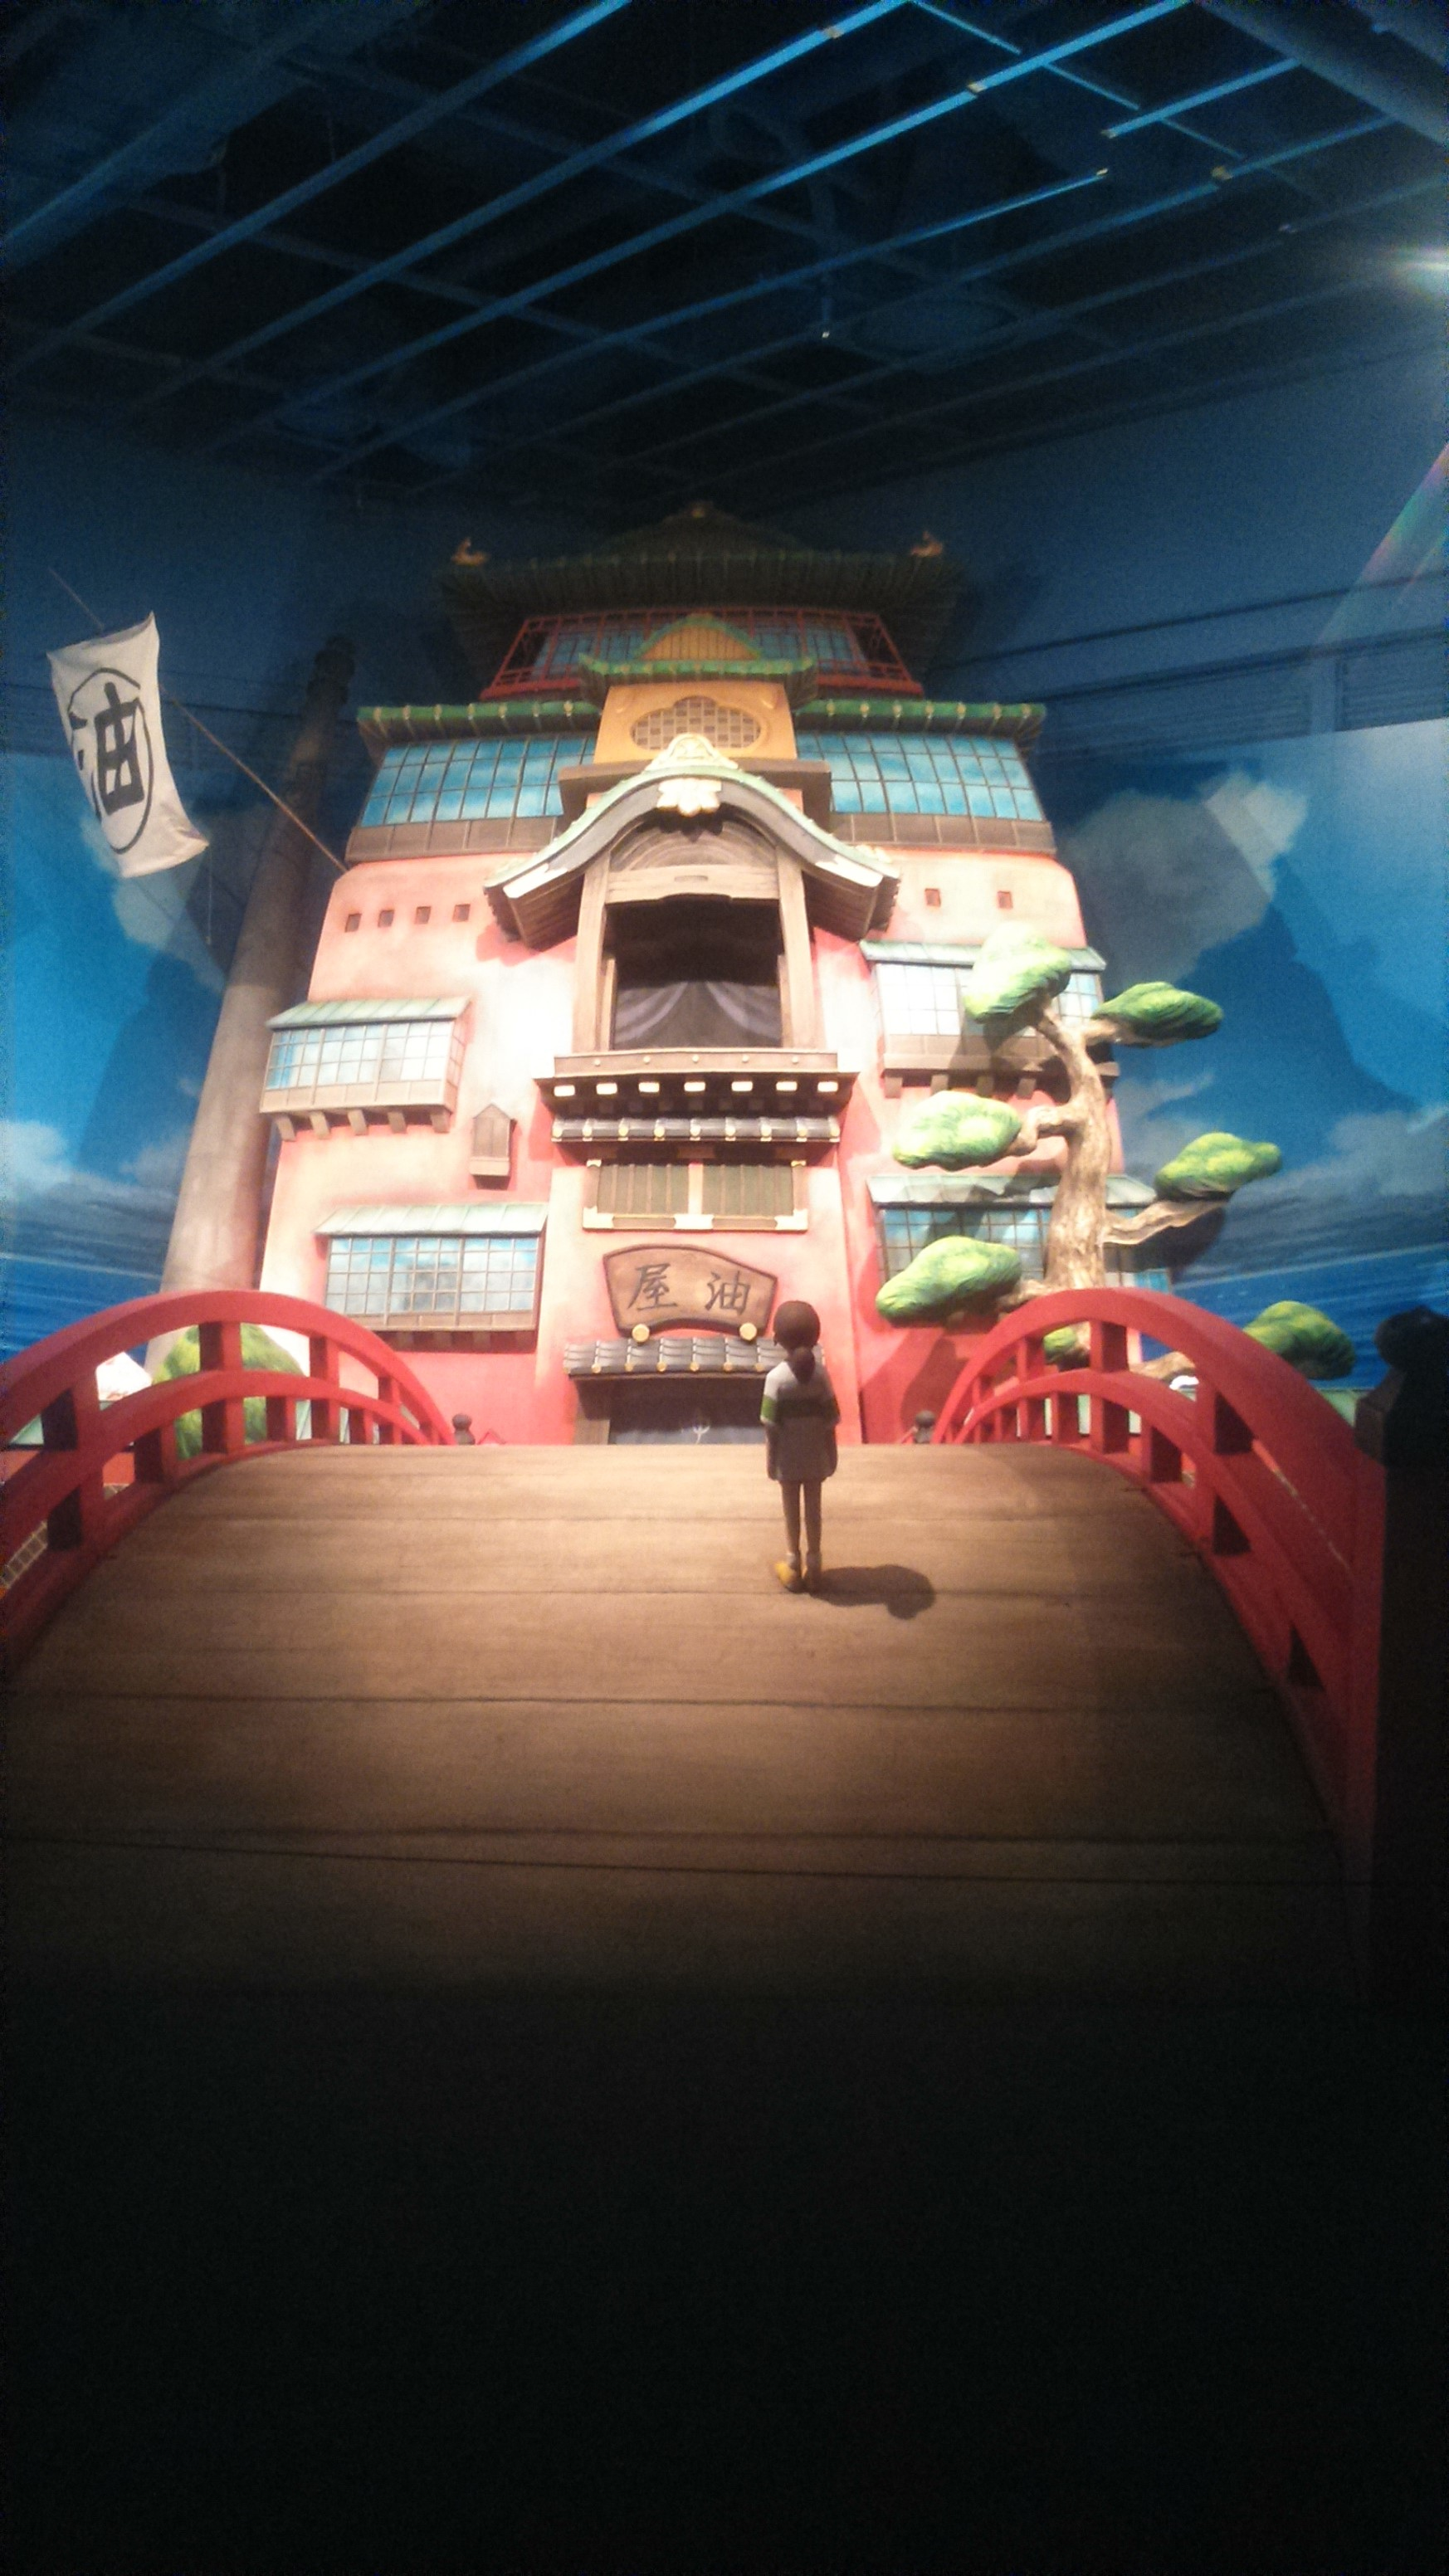 Studio Ghibli exhibit in Seoul